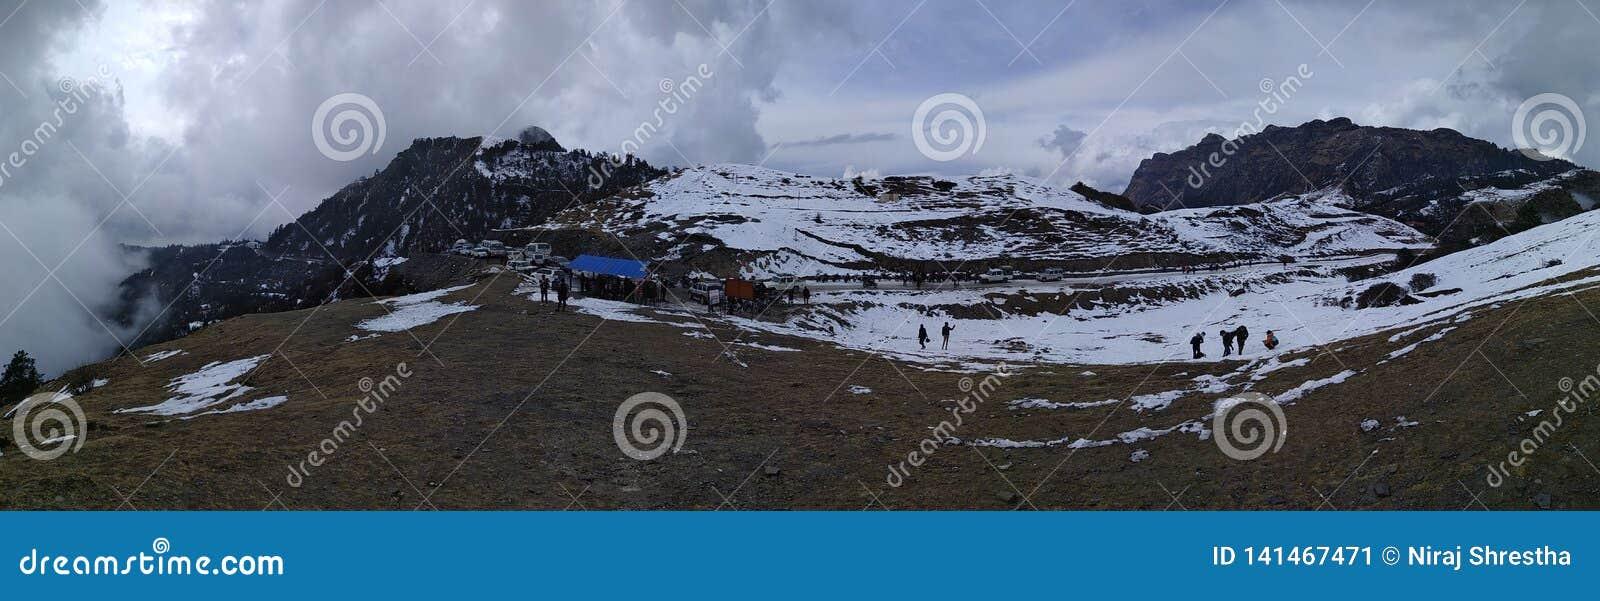 Kalinchowk-Berge im Winter, Nepal